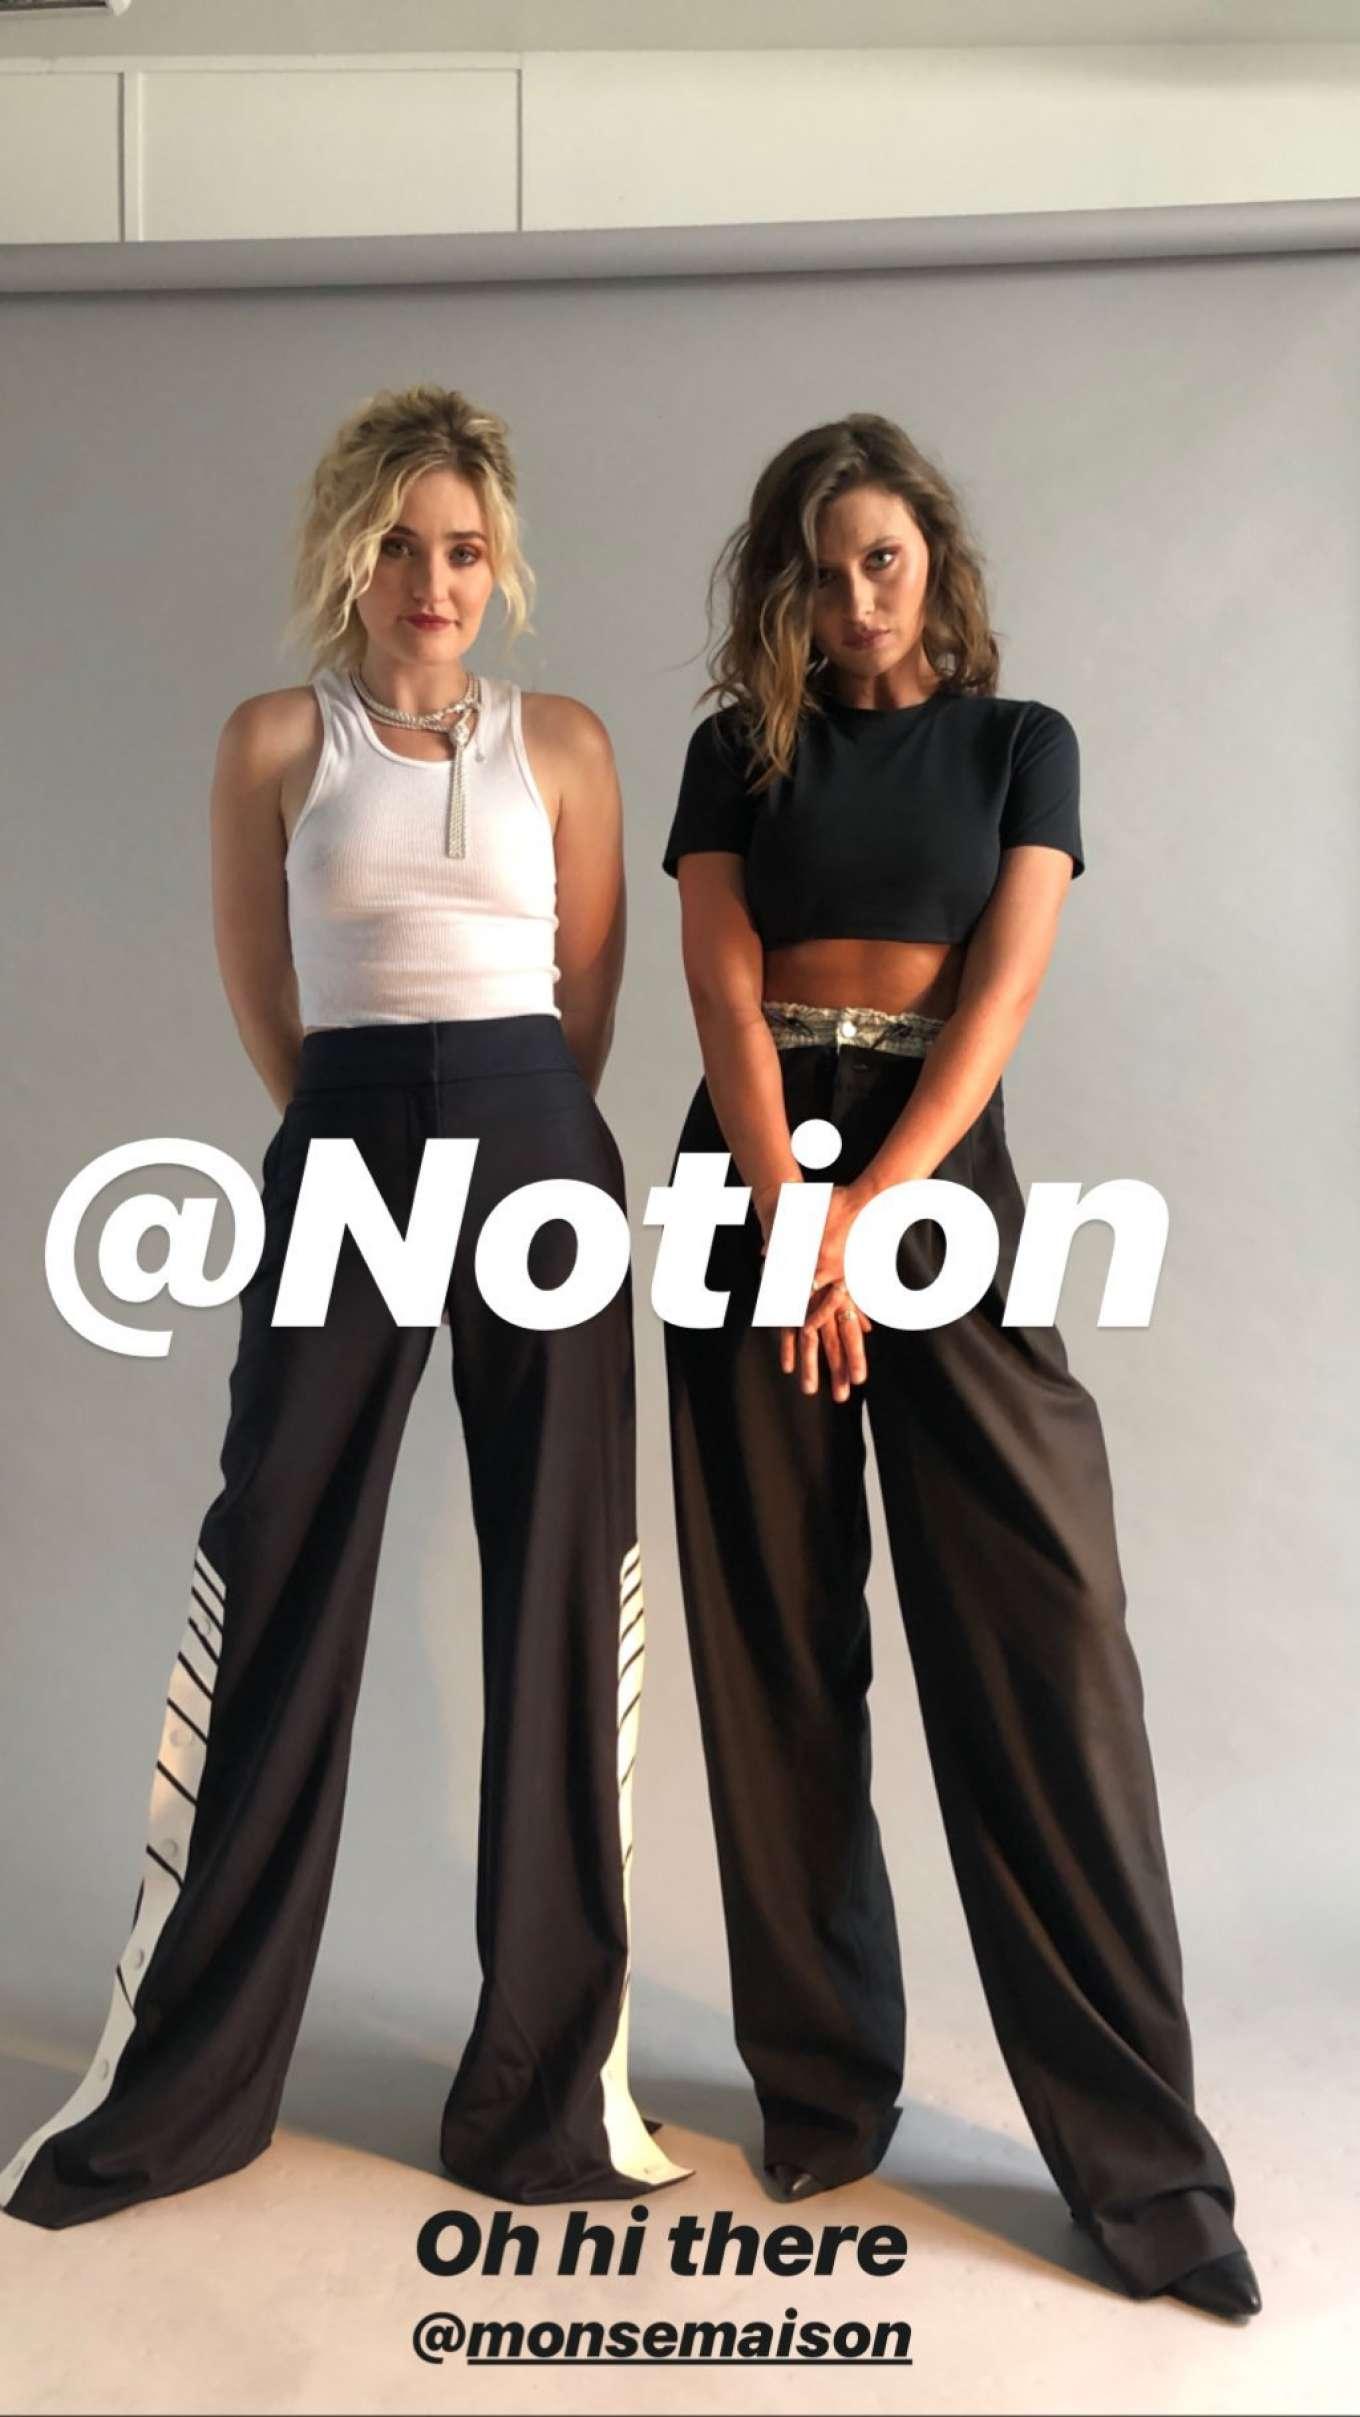 AJ Michalka 2019 : AJ and Aly Michalka – Notion Magazine 2019-03